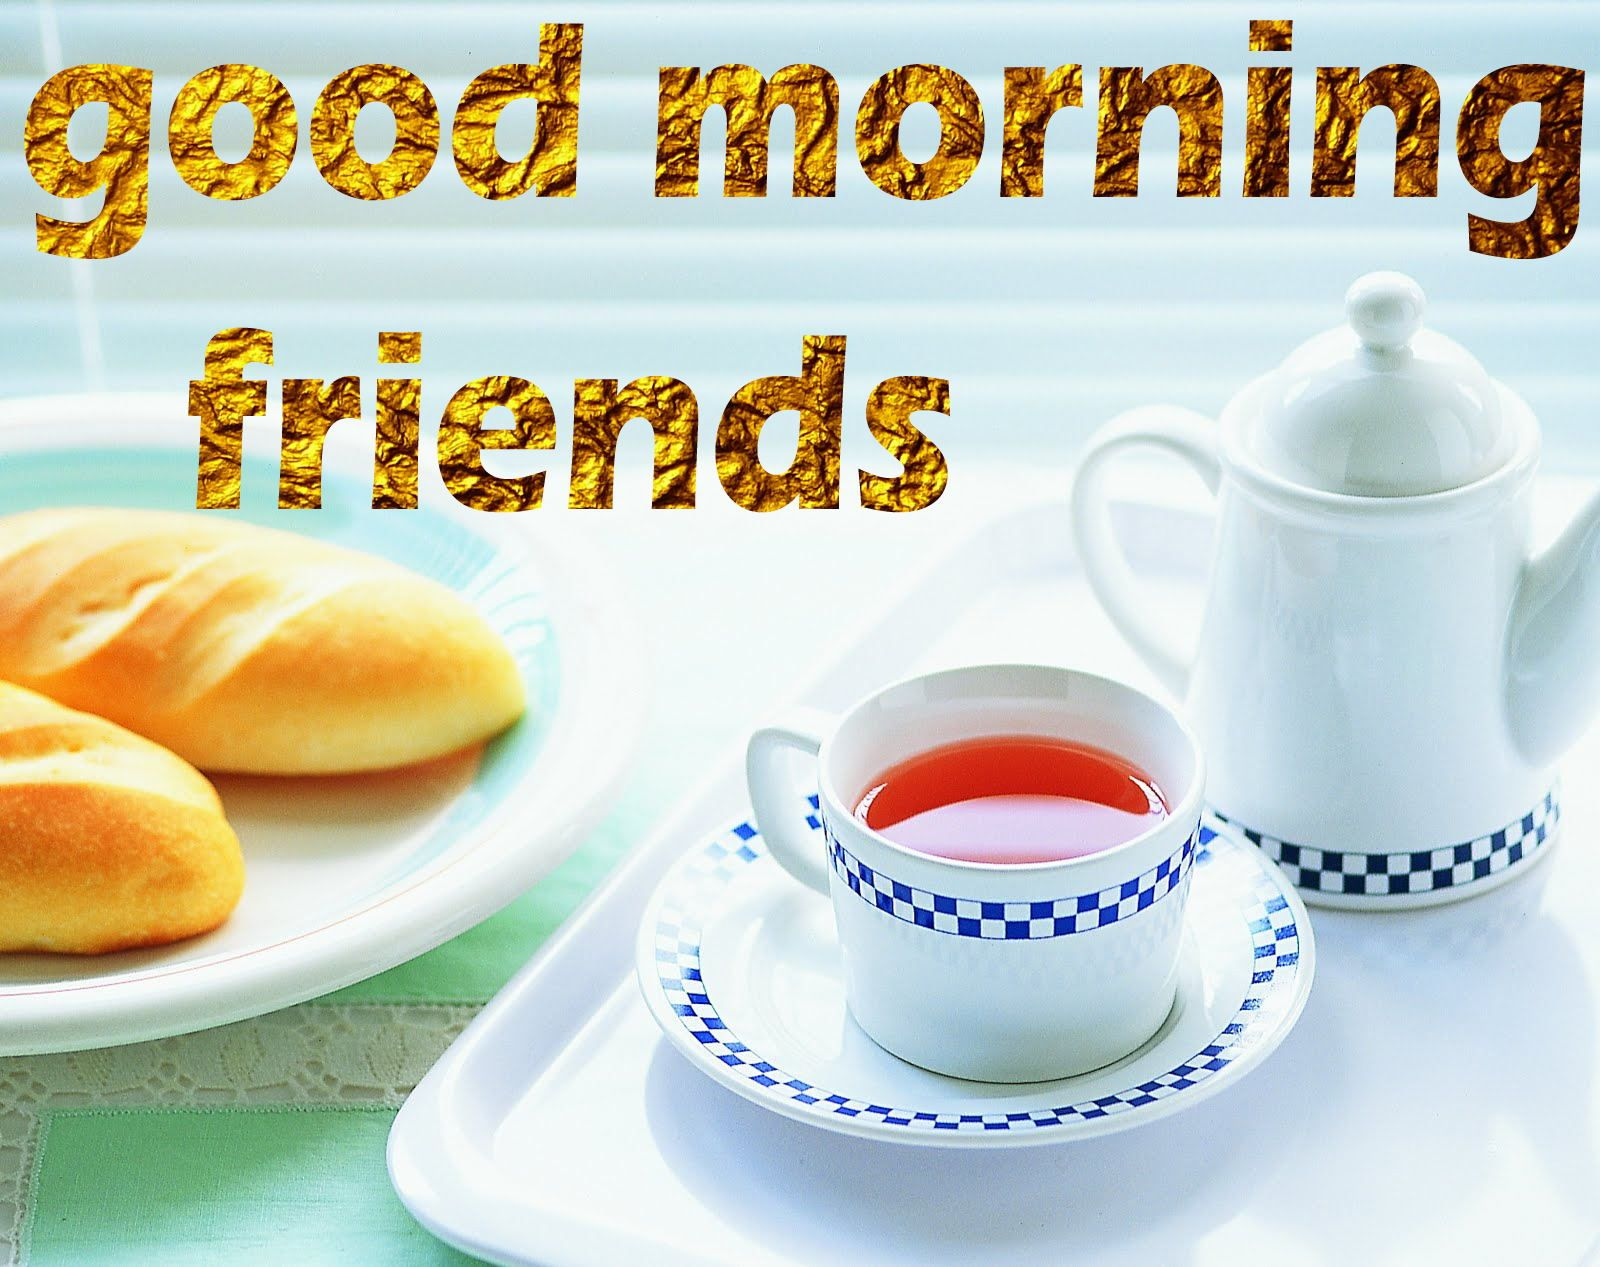 Good Morning Wallpapers Hd 41 1600x1267